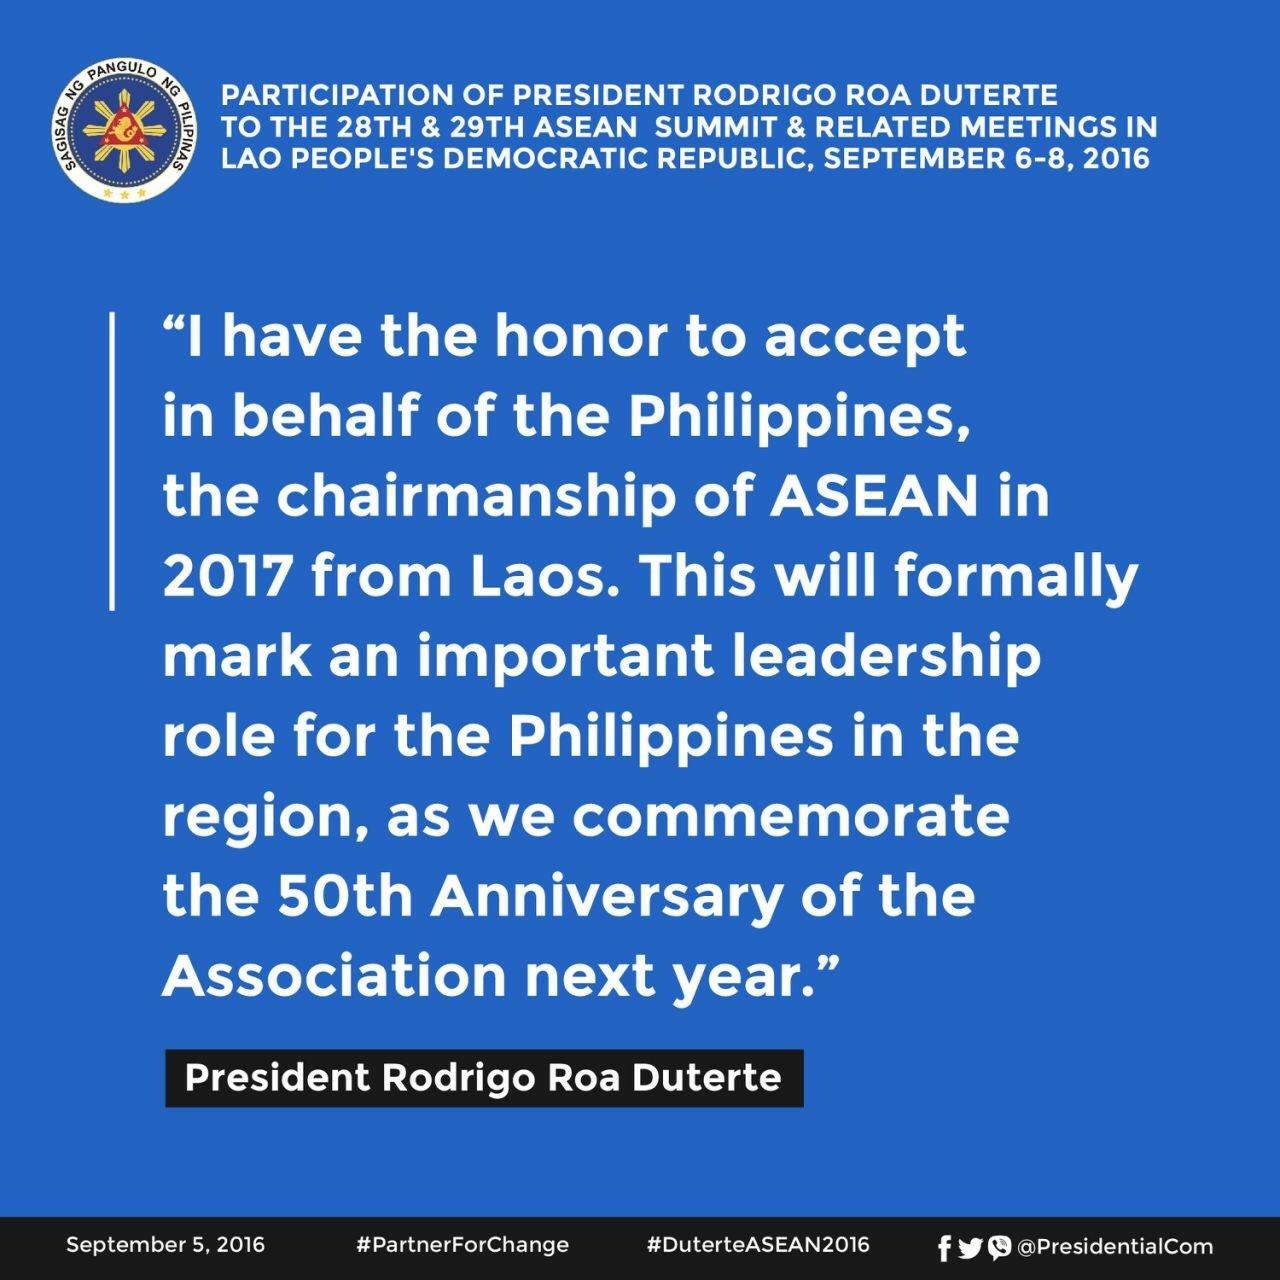 #PresidentDuterte will be accepting the chairmanship of ASEAN's 50th Anniversary. #DuterteASEAN2016 https://t.co/SiAXrsvJp0